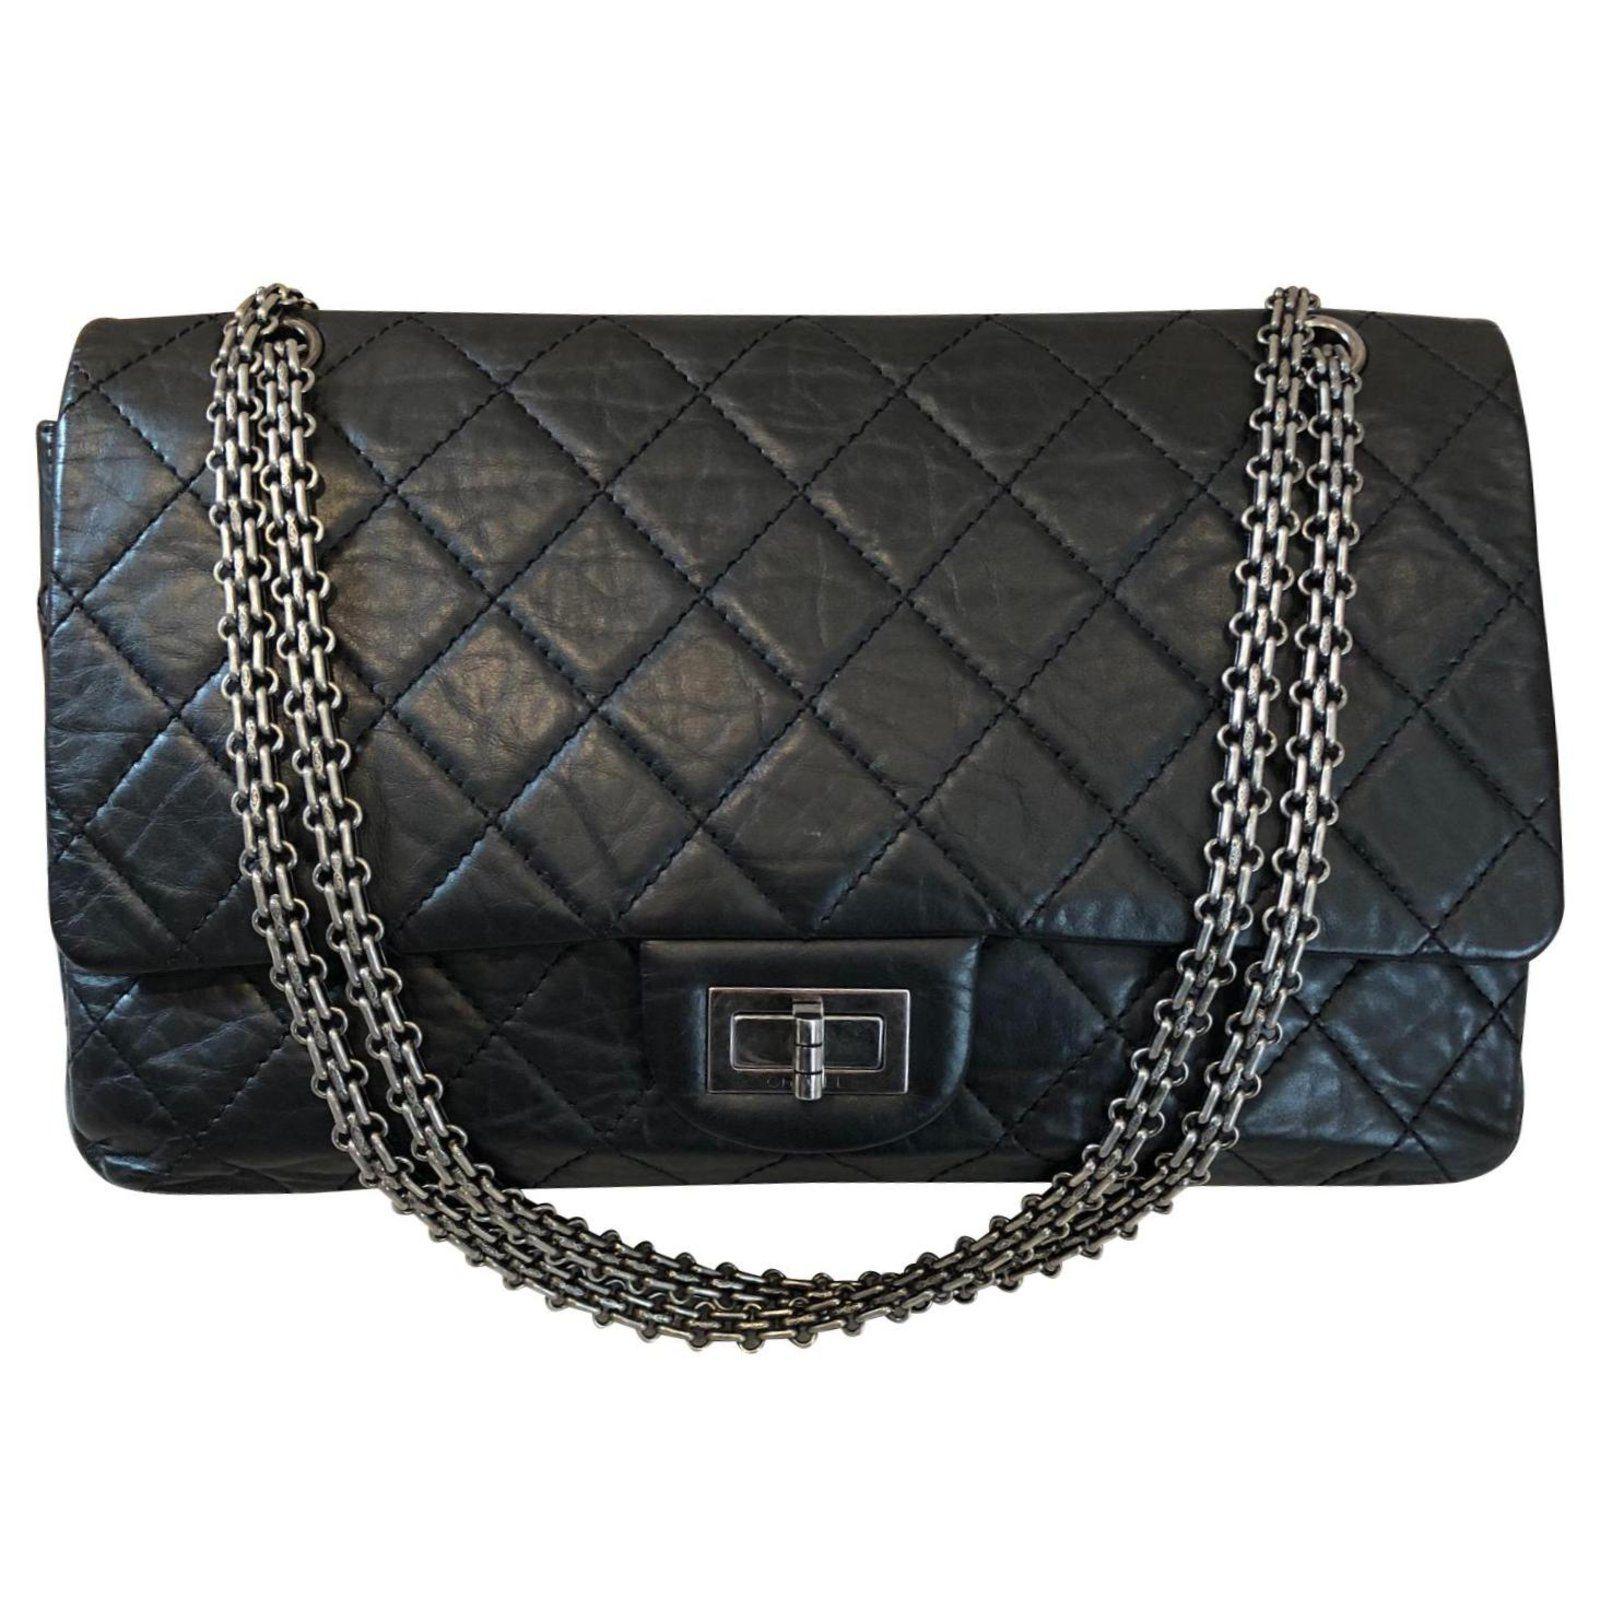 cdab79e6d4b5 Sacs à main Chanel Reissue 2.55 Cuir vernis Noir ref.111158 - Joli Closet